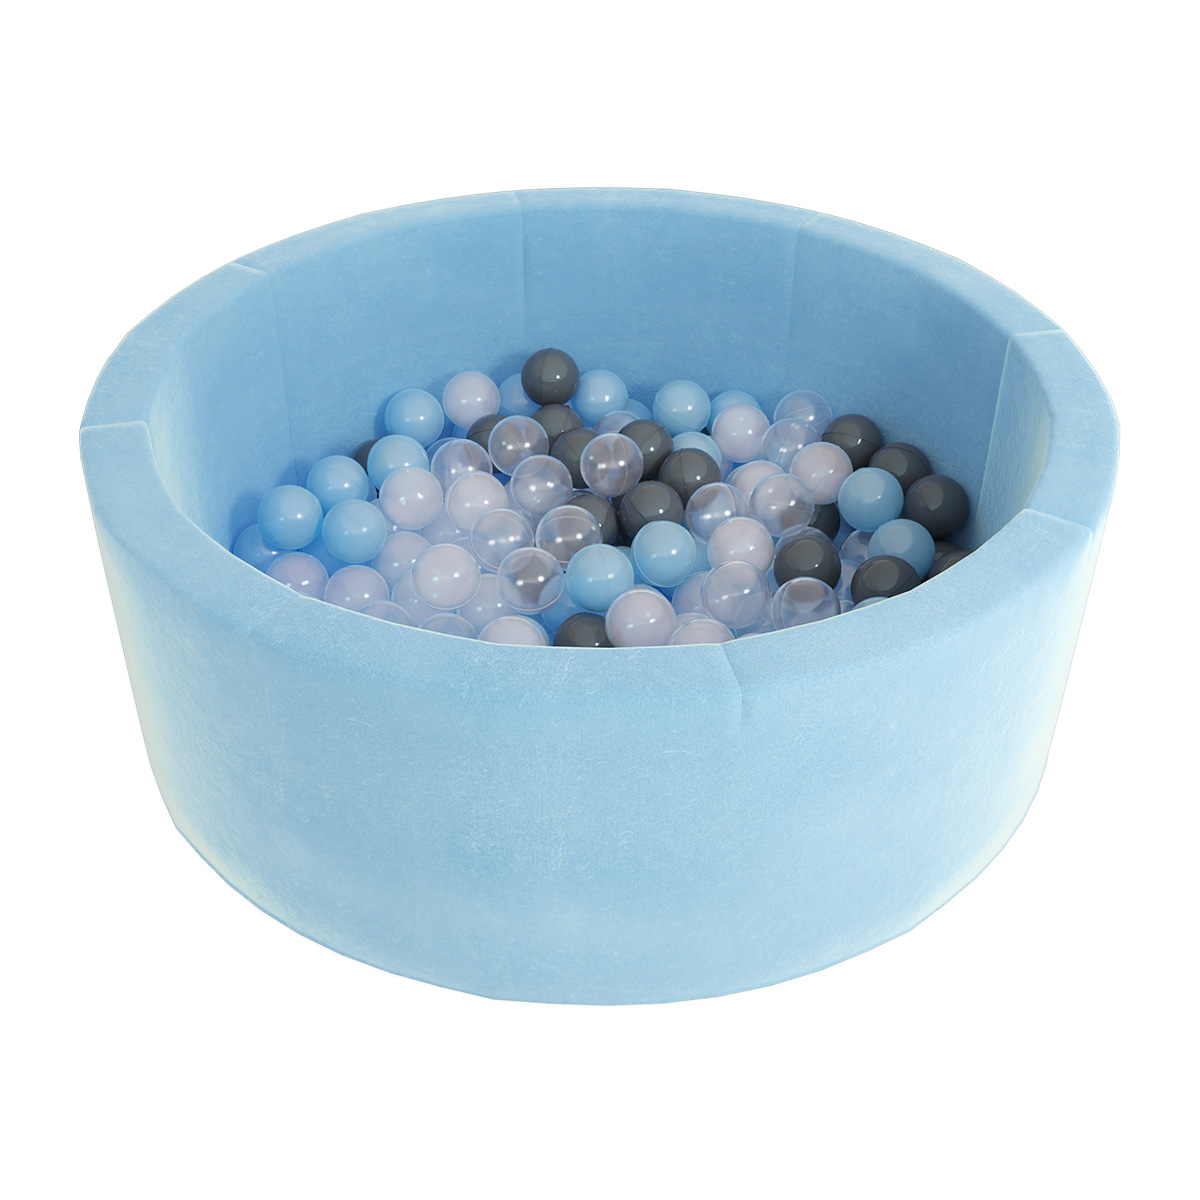 Купить Детский сухой бассейн Romana Airpool Max голубой + 300 шаров, Romana (Романа)